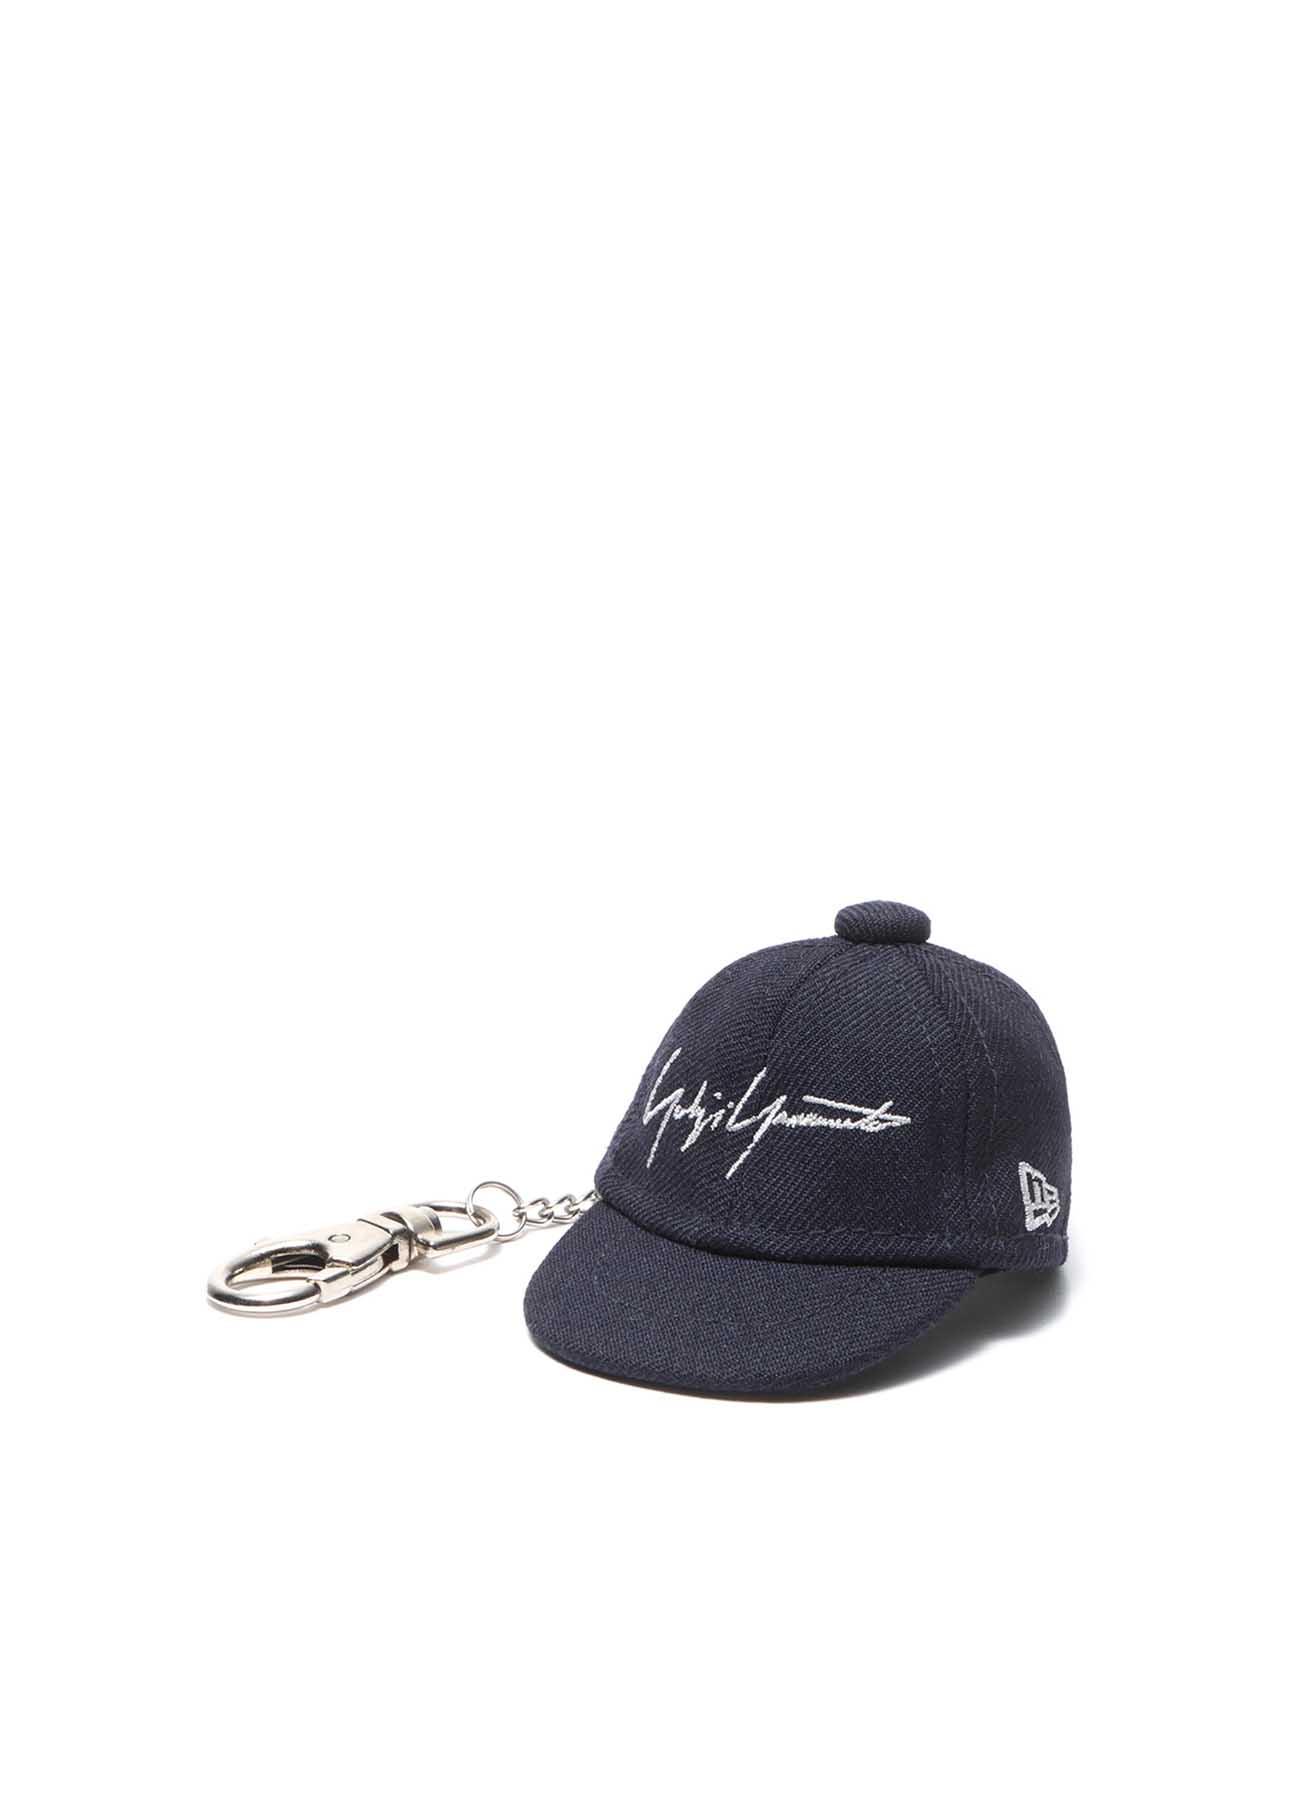 Yohji Yamamoto × New Era BLACK SERGE CAP KEYHOLDER NAVY/GRAY